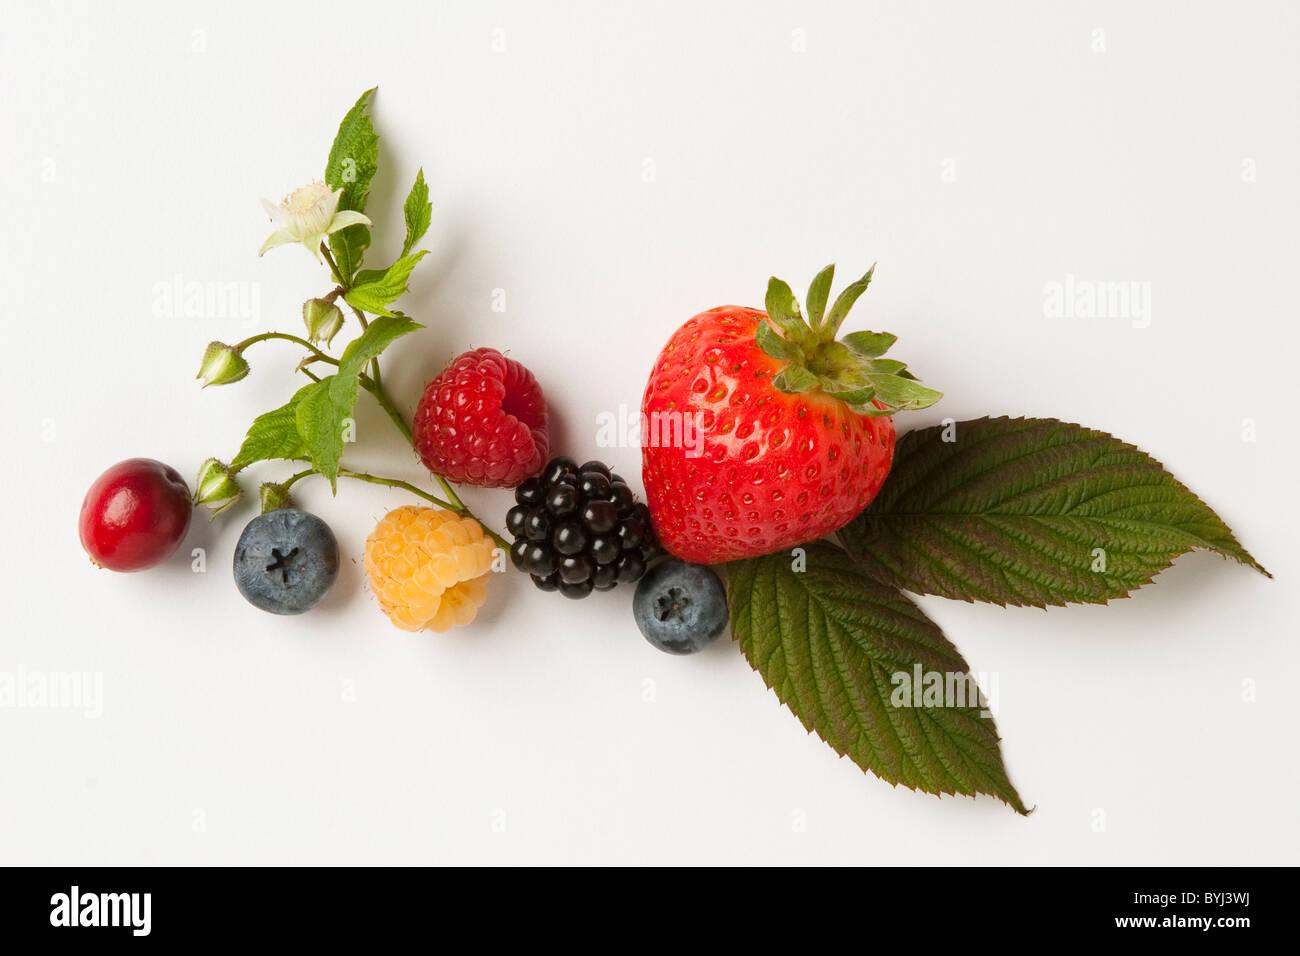 Mischung aus Beeren: Erdbeere, rote und goldene Himbeeren, Brombeere, Heidelbeere und Cranberry mit Blättern Stockbild